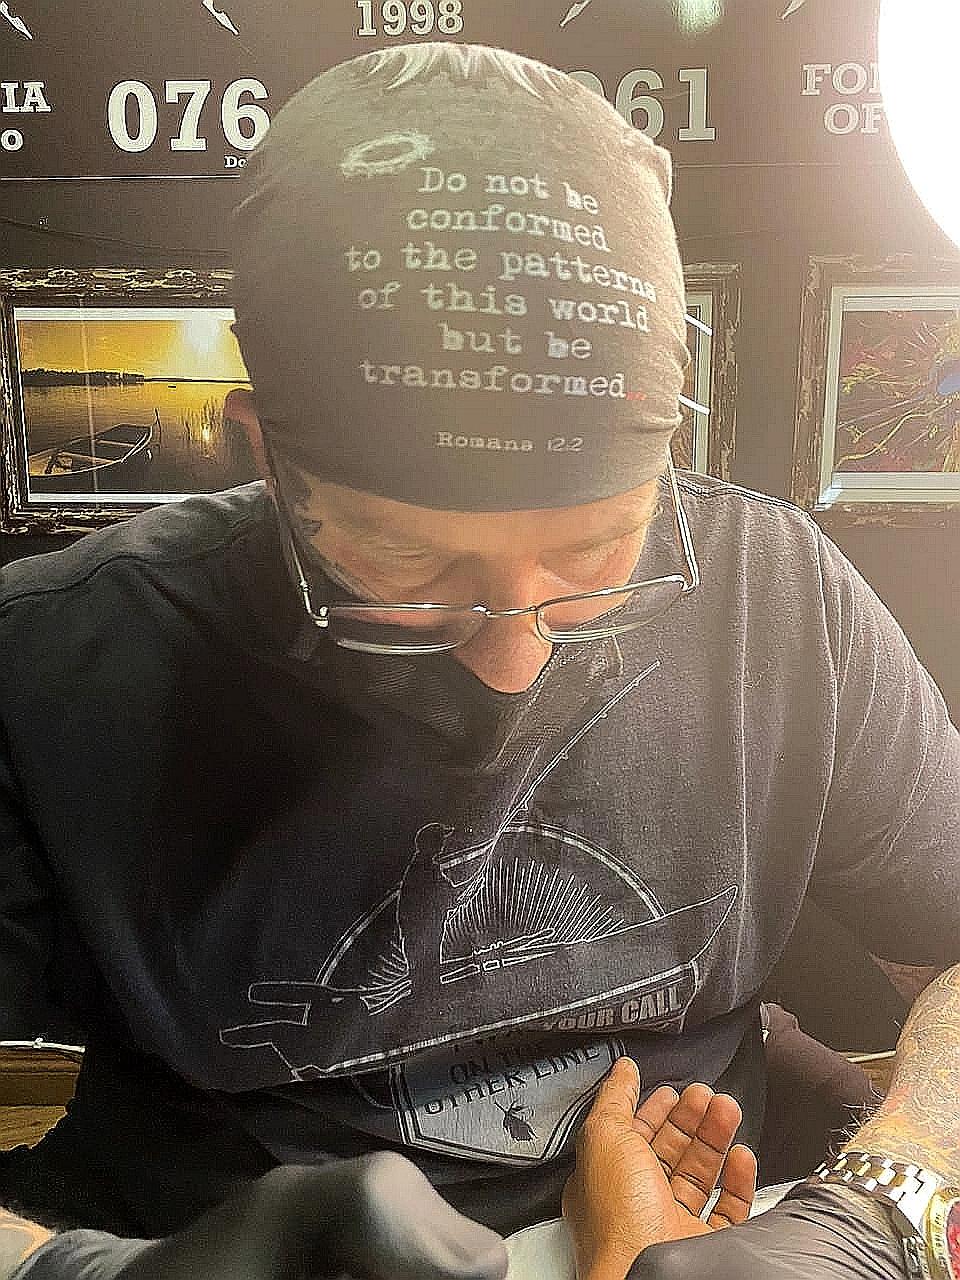 christain tattoo artist